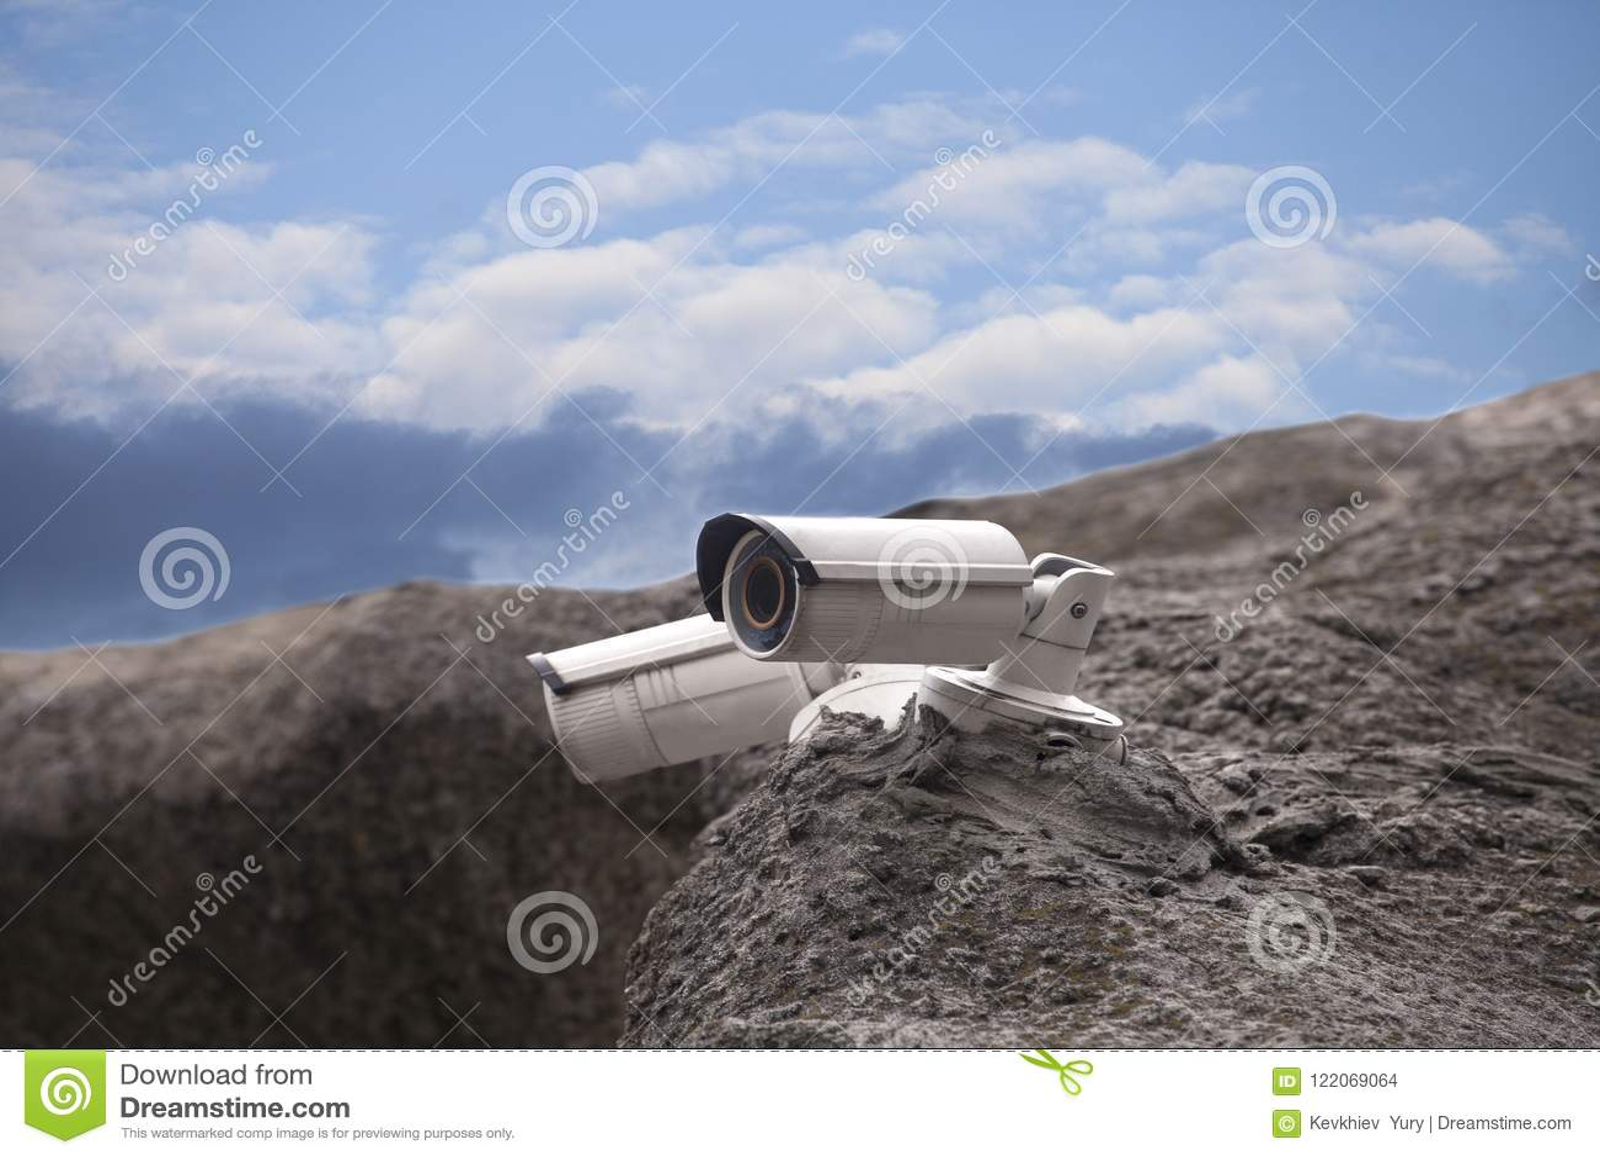 Rock Camera Surveillance : Surveillance security camera stock photo image of concrete